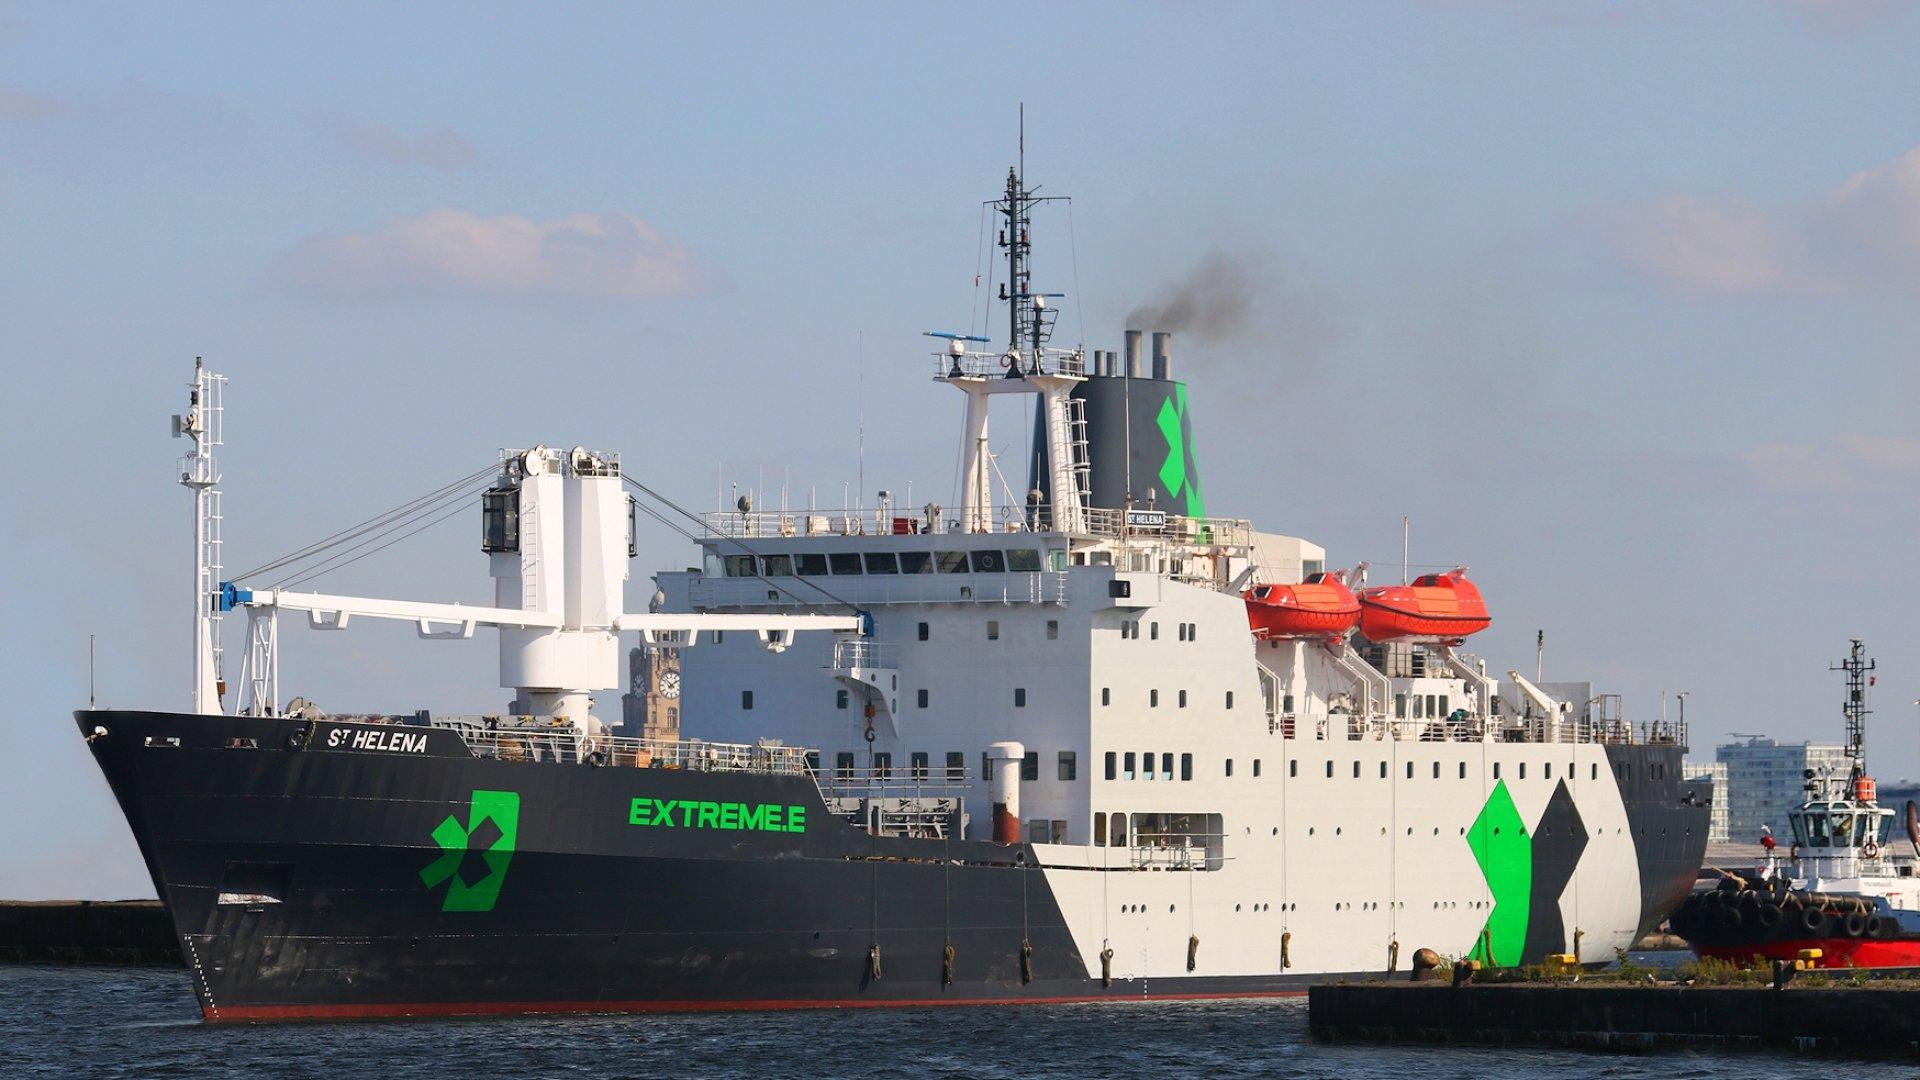 RMS St Helena - Extreme E